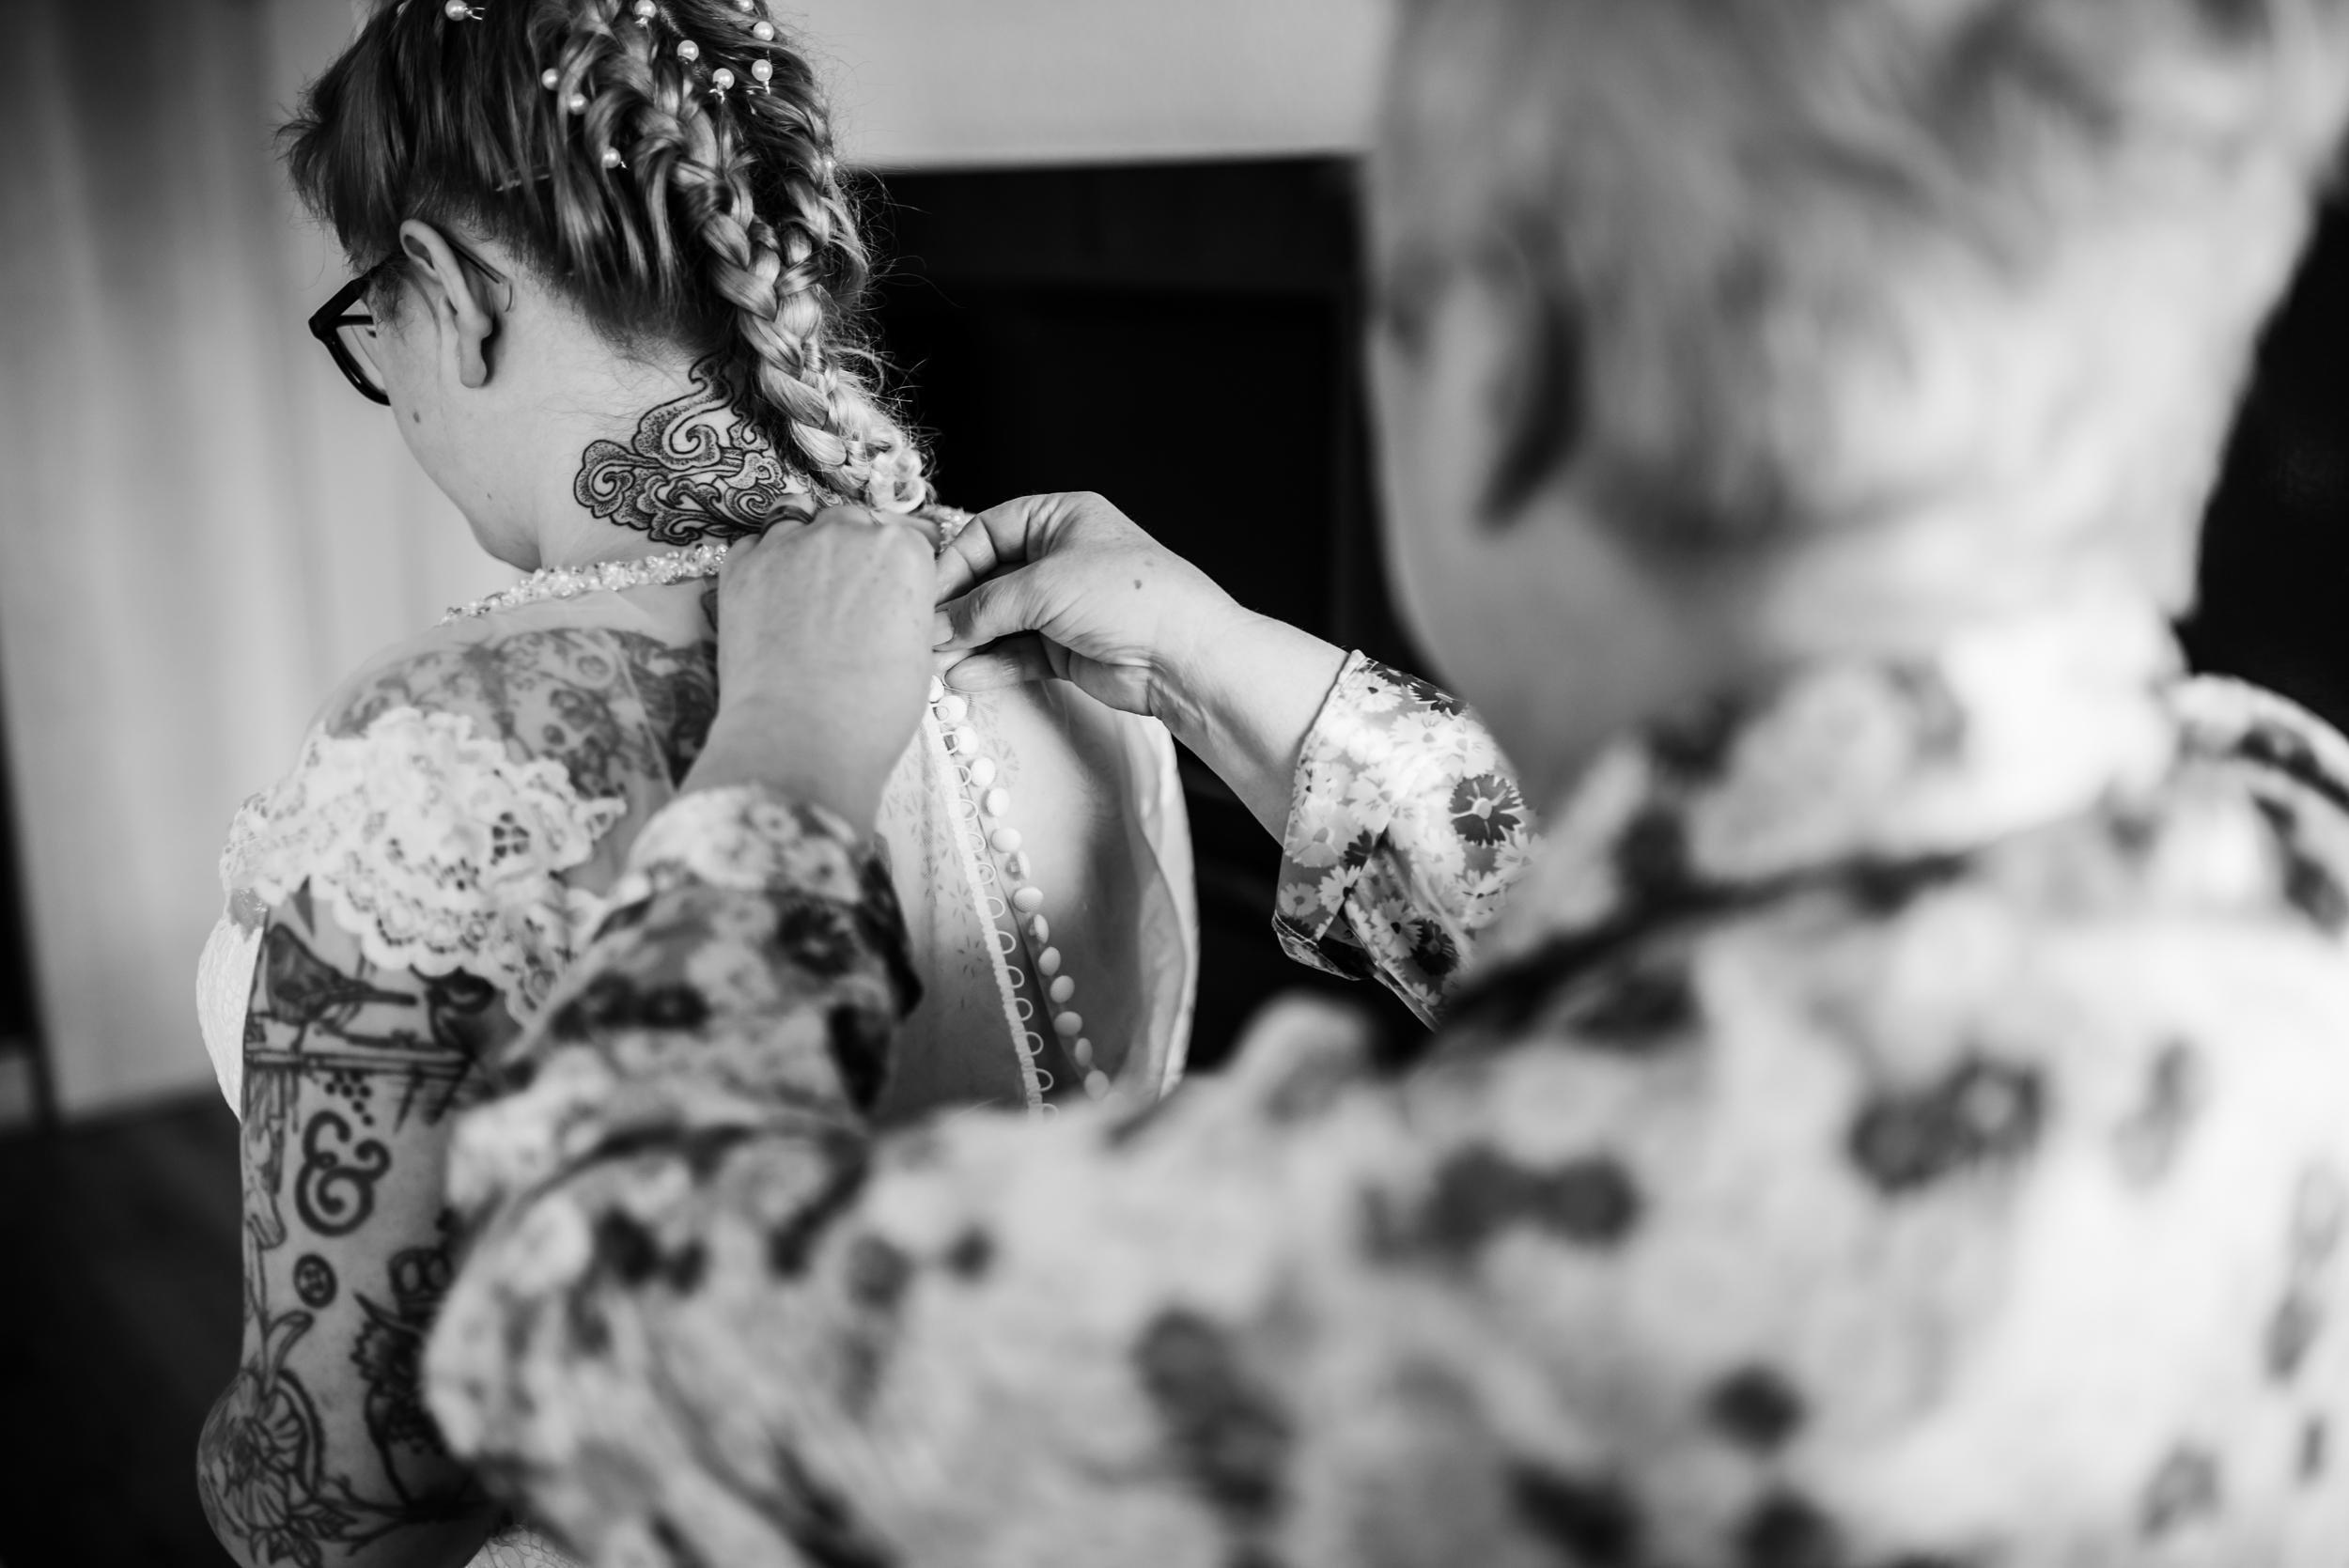 Mum does up the brides dress